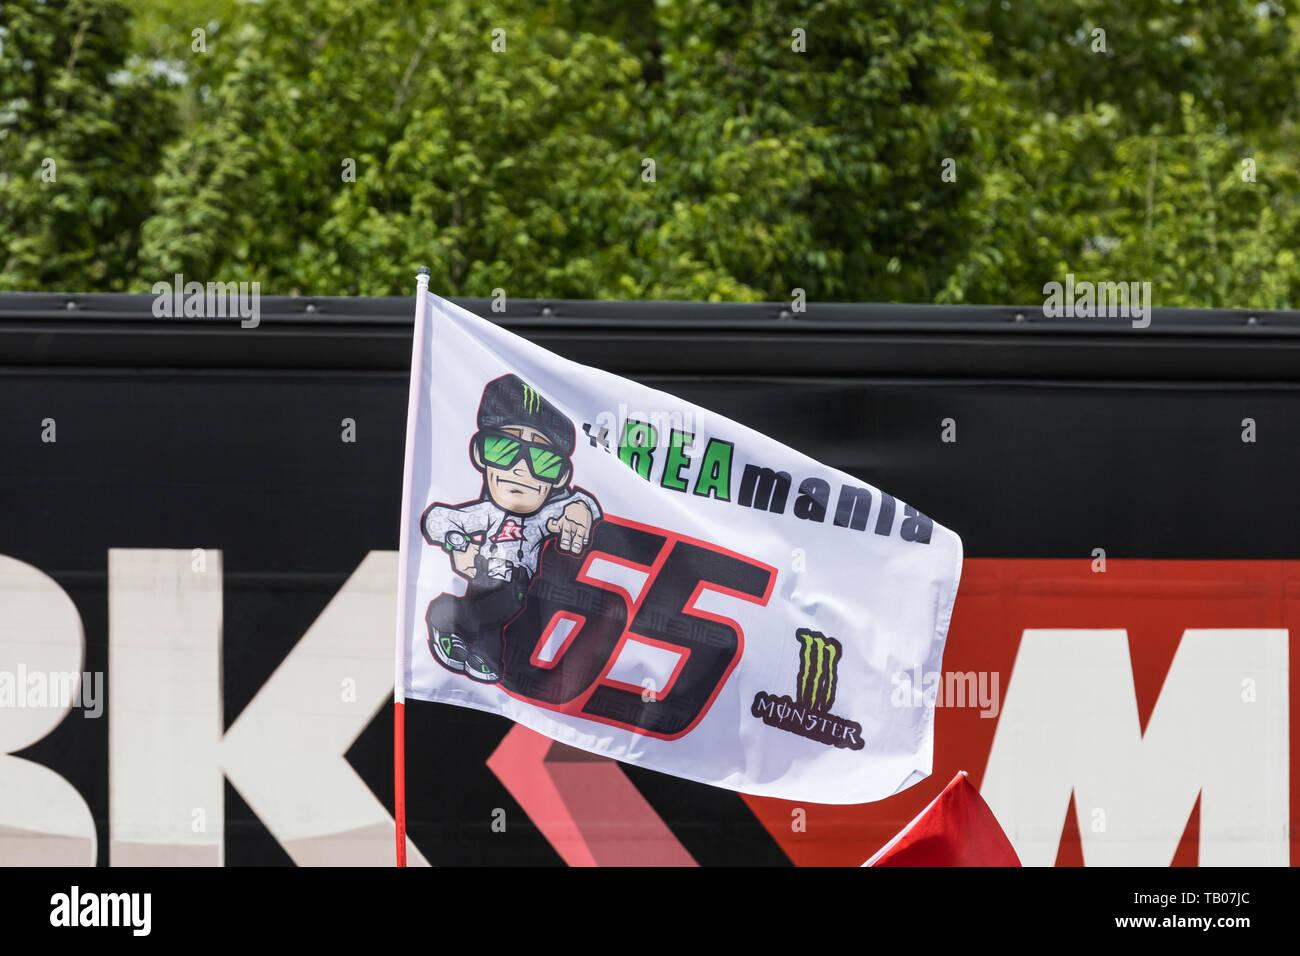 Jonathan Rea (professional motorcycle racer) fan club flag - Stock Image